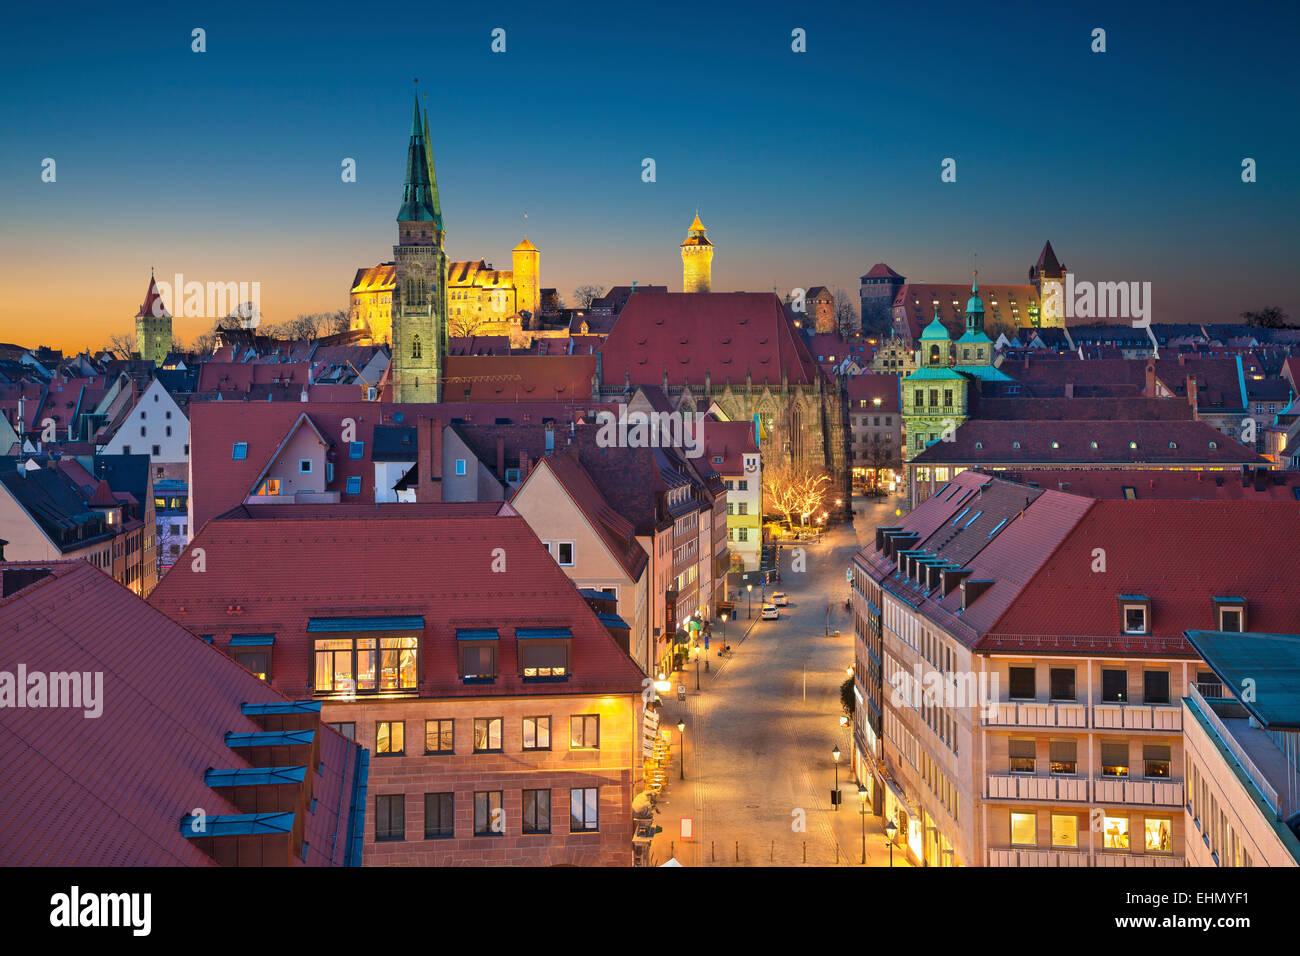 Nuremberg.  Image of historic downtown of Nuremberg, Germany at sunset. - Stock Image